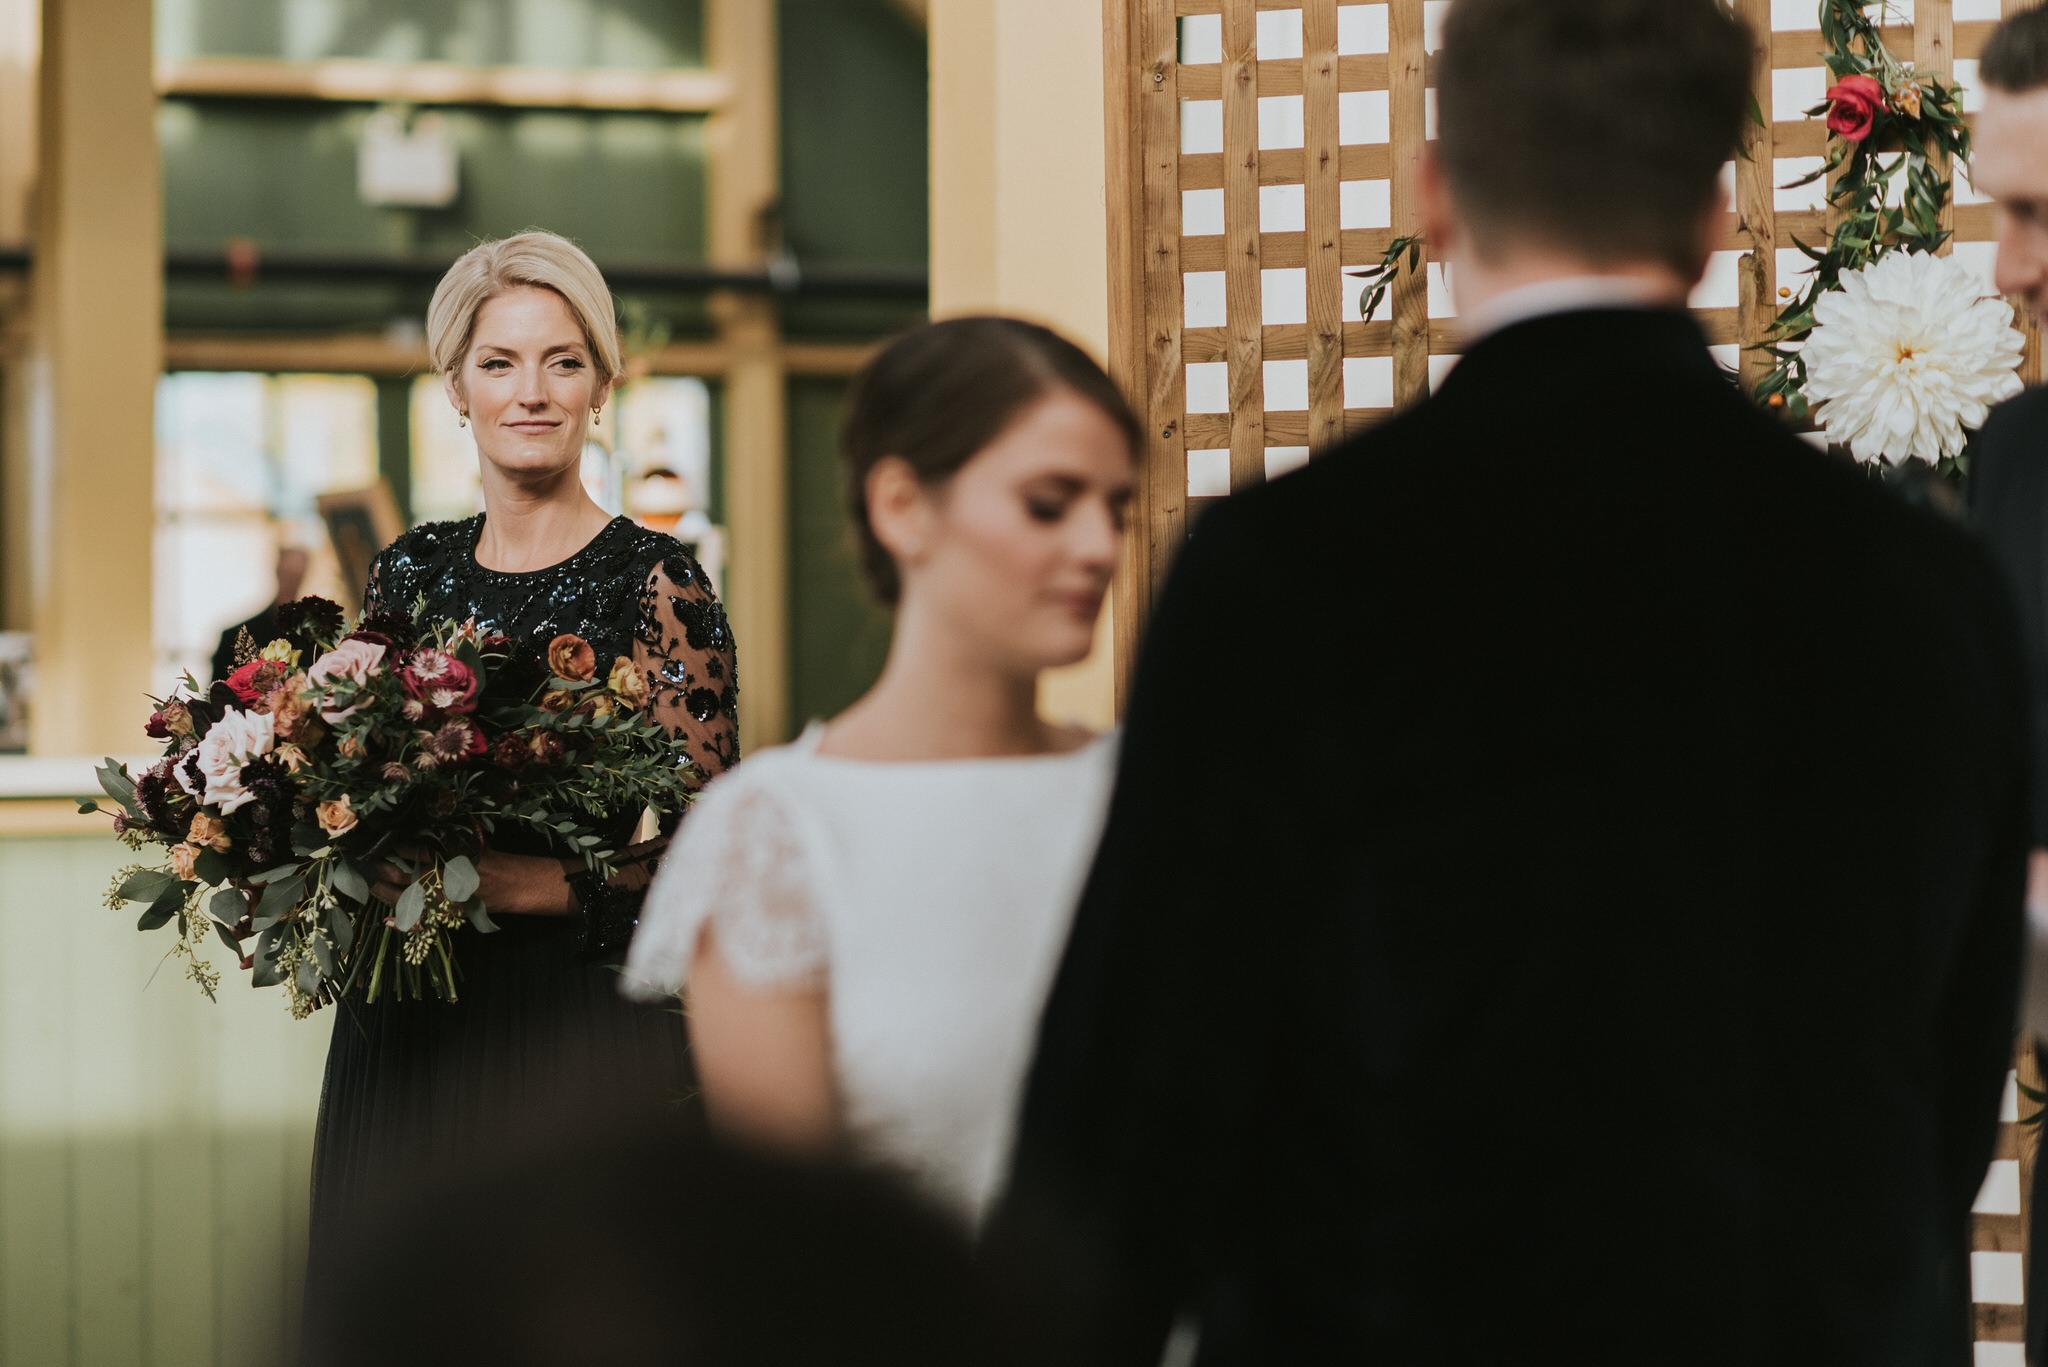 scarletoneillphotography_weddingphotography_prince edward county weddings114.JPG